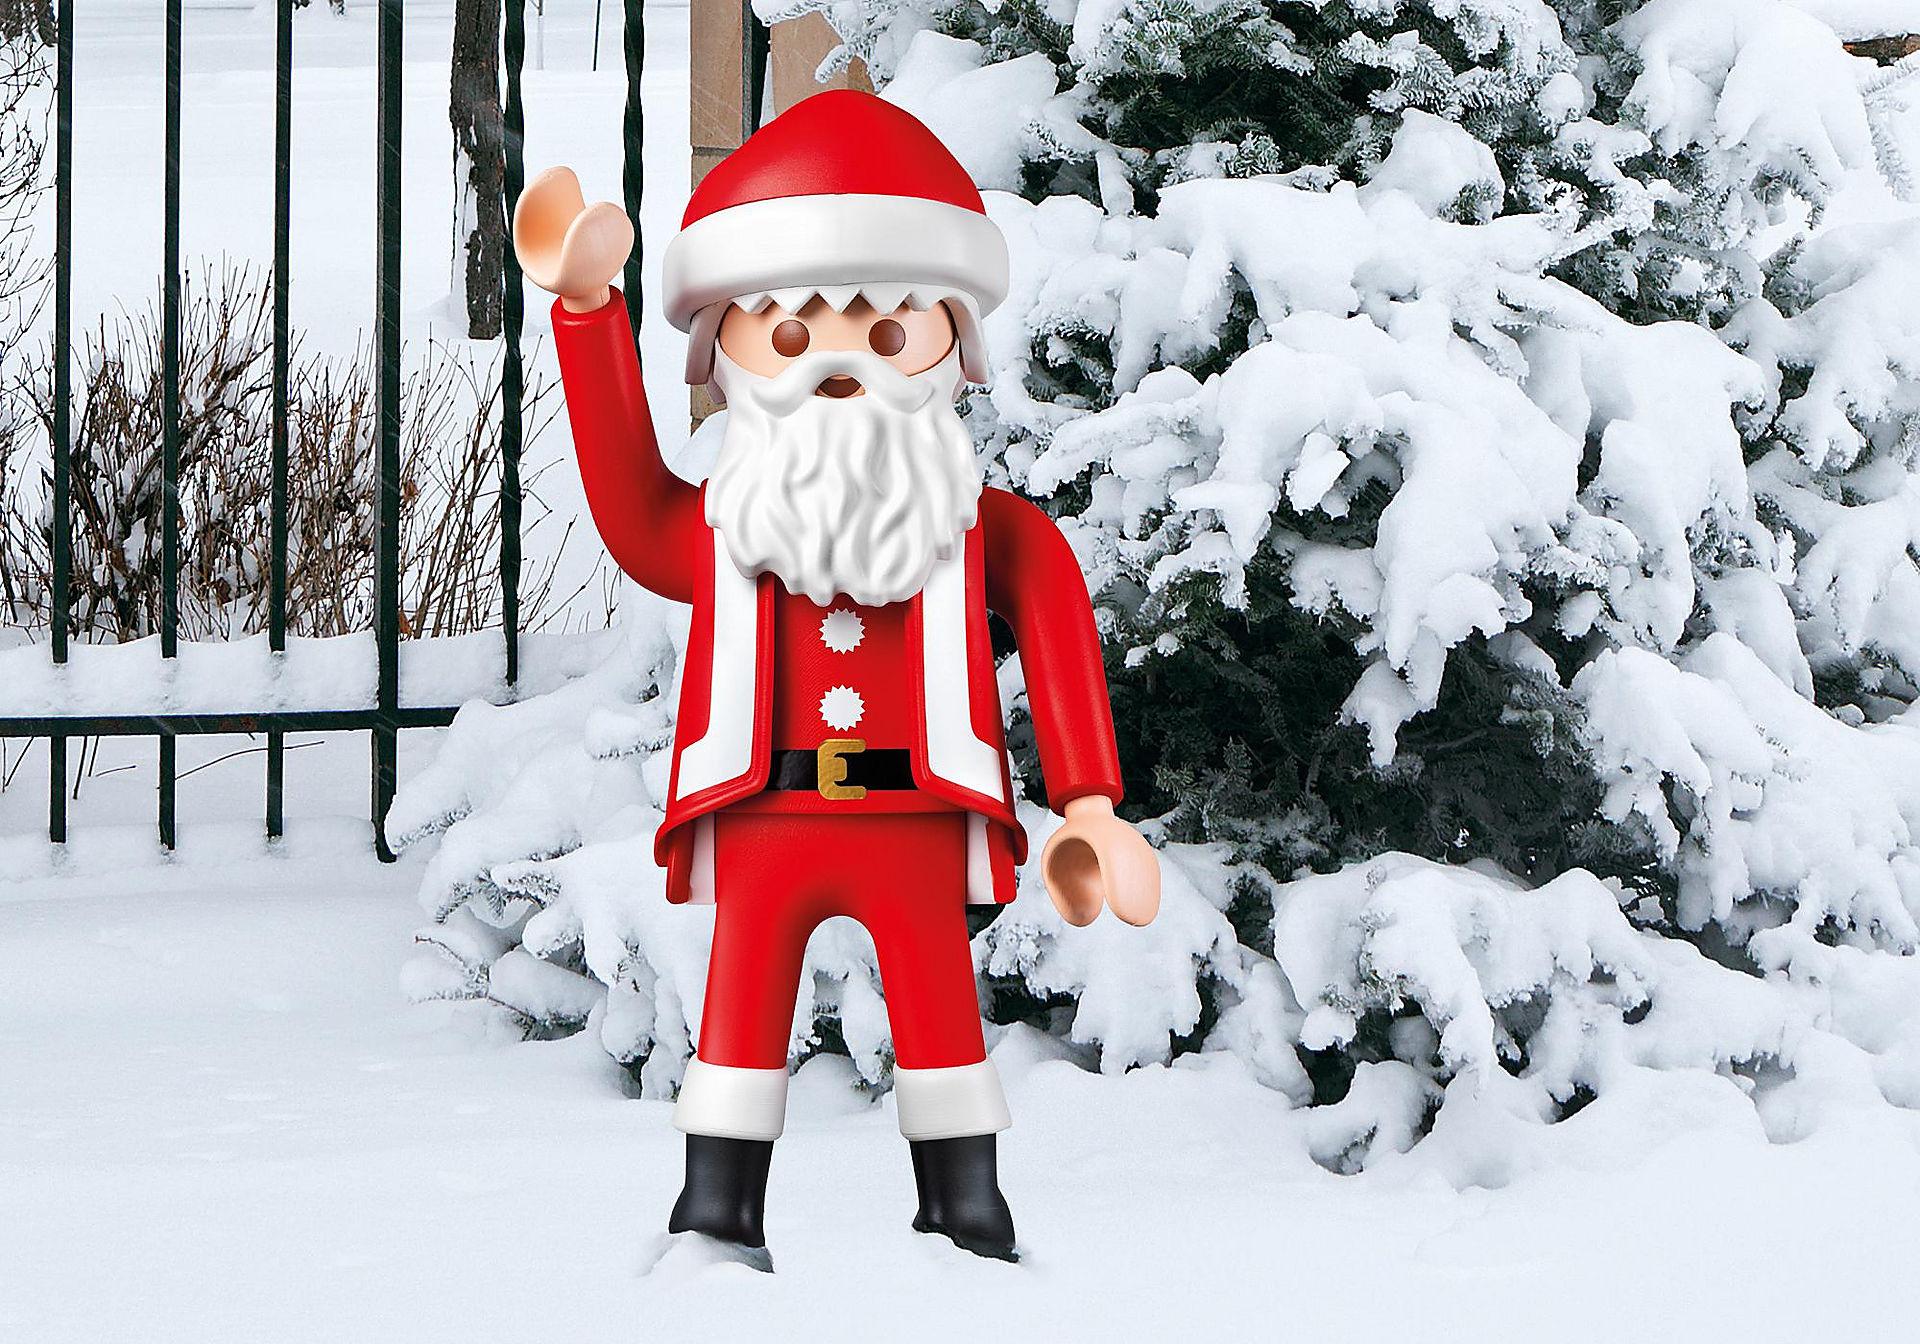 6629 PLAYMOBIL XXL Santa Claus zoom image5